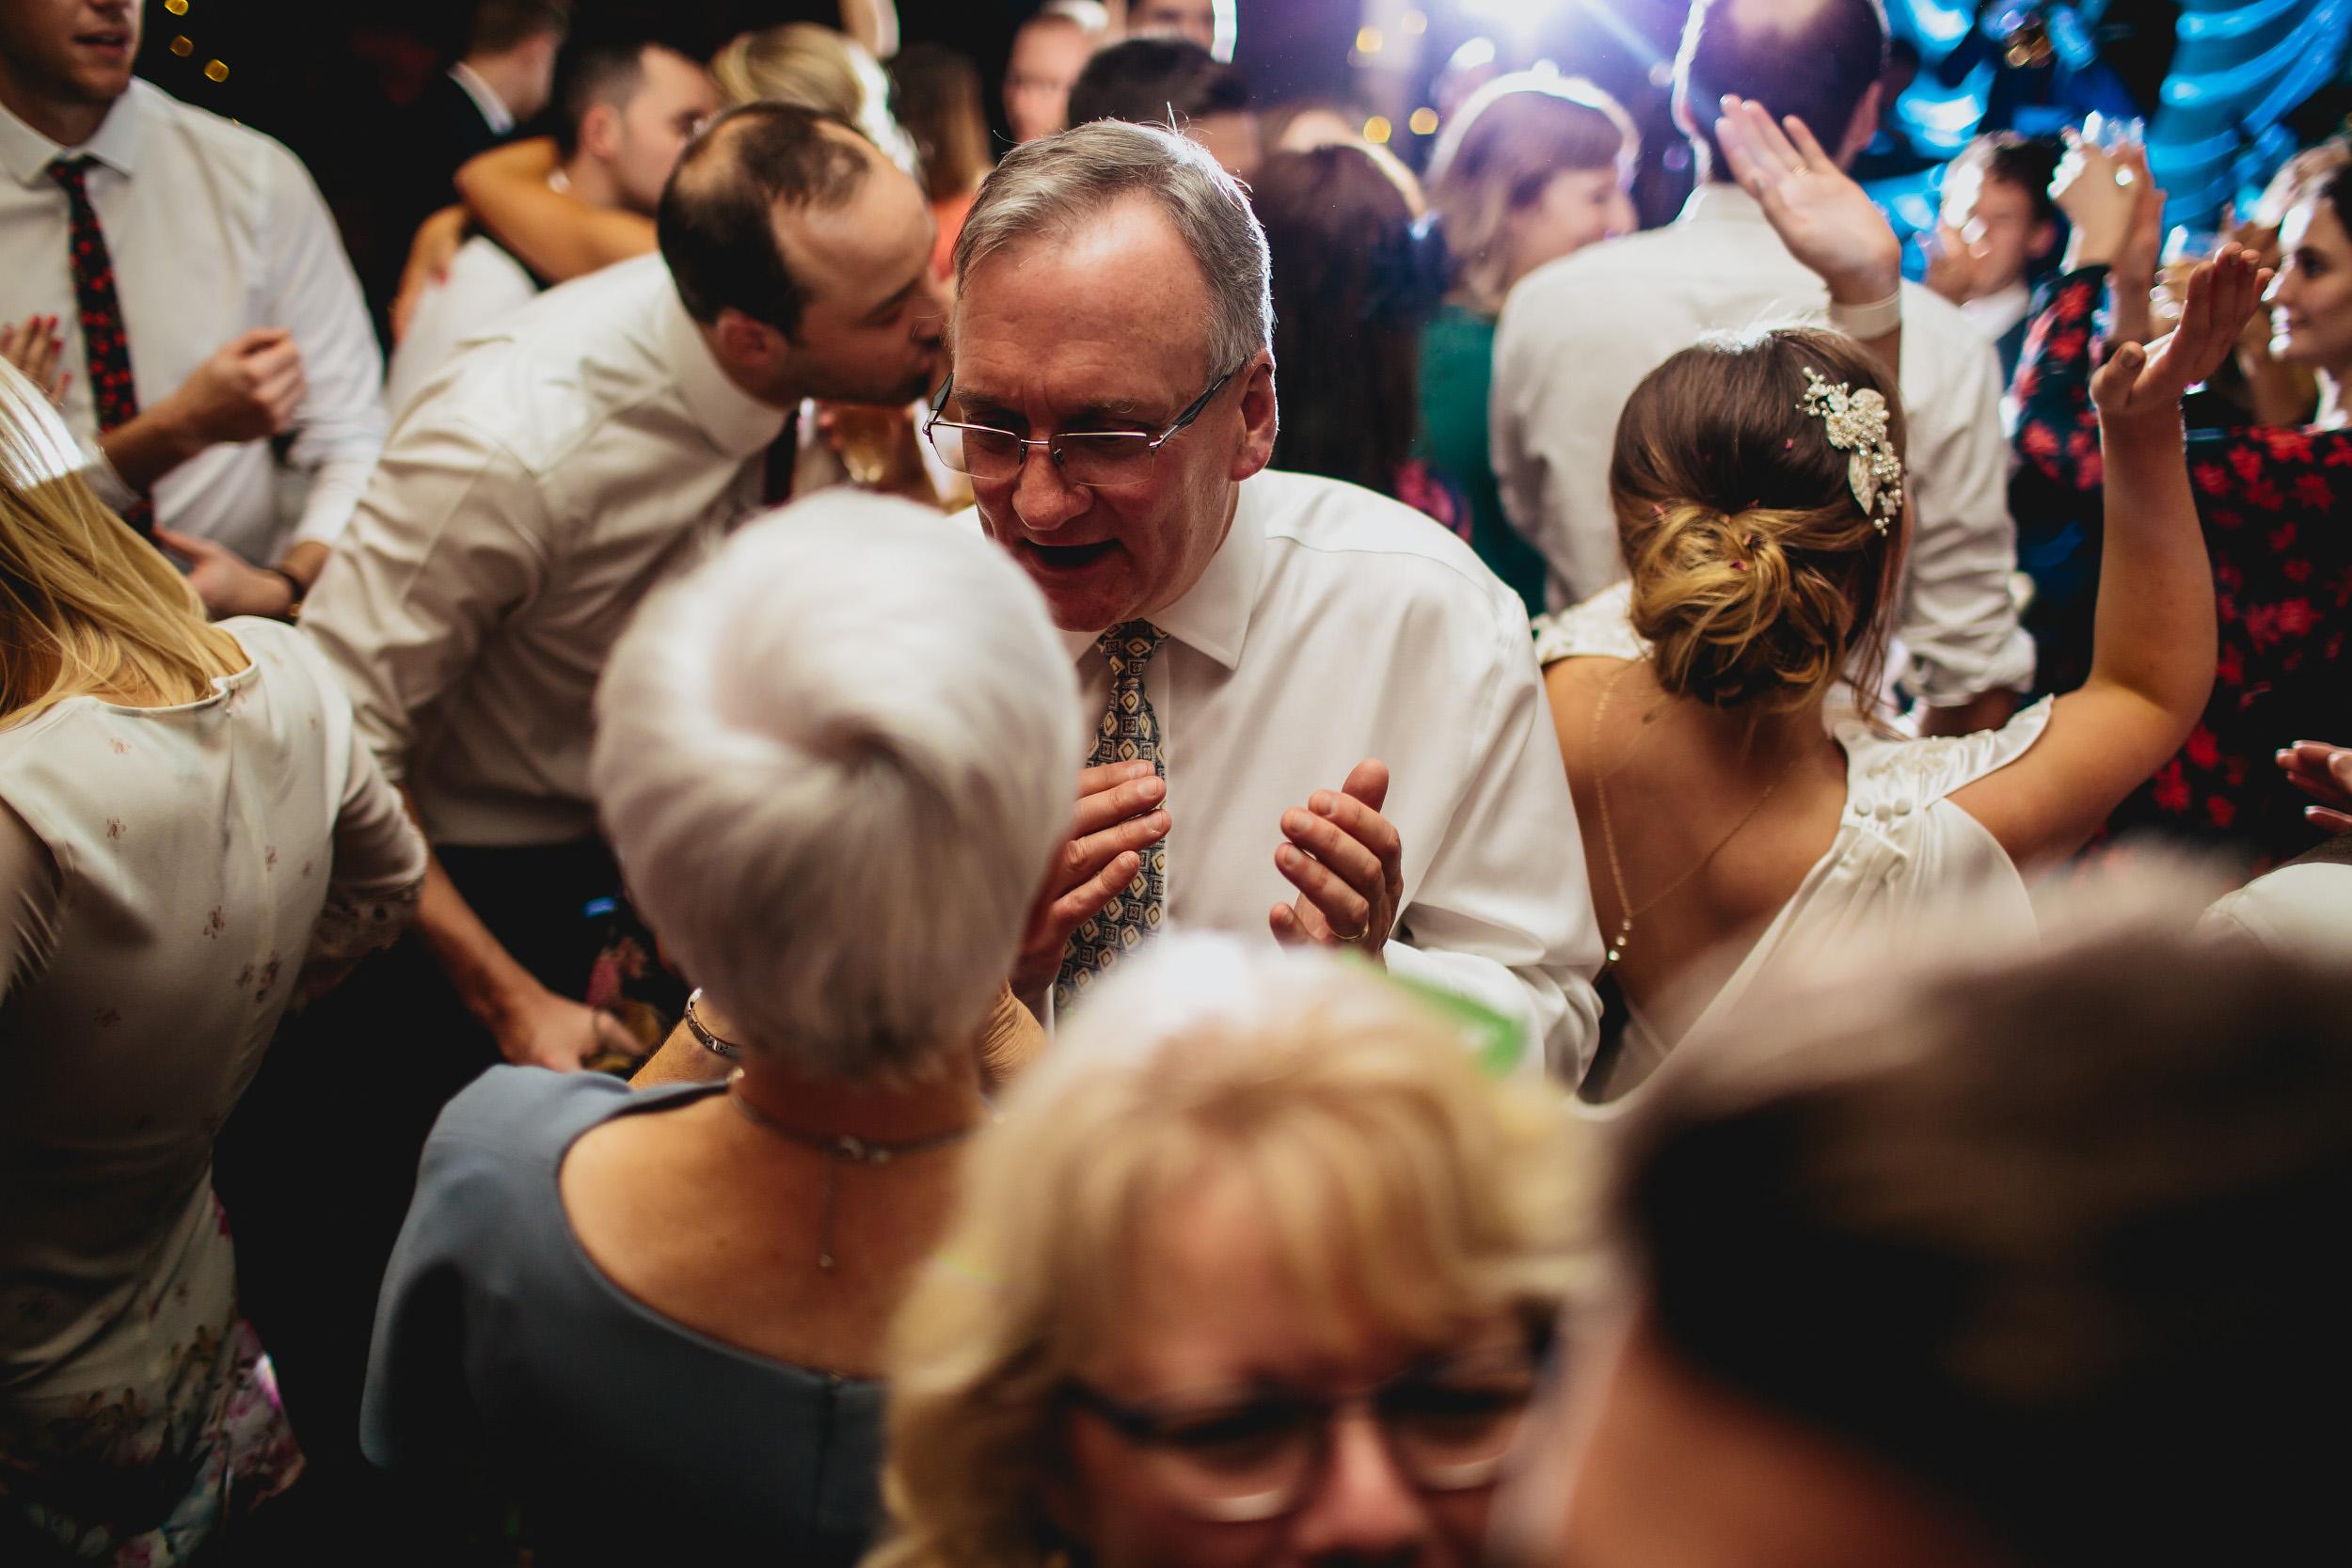 Wedding guests dancing in Yorkshire